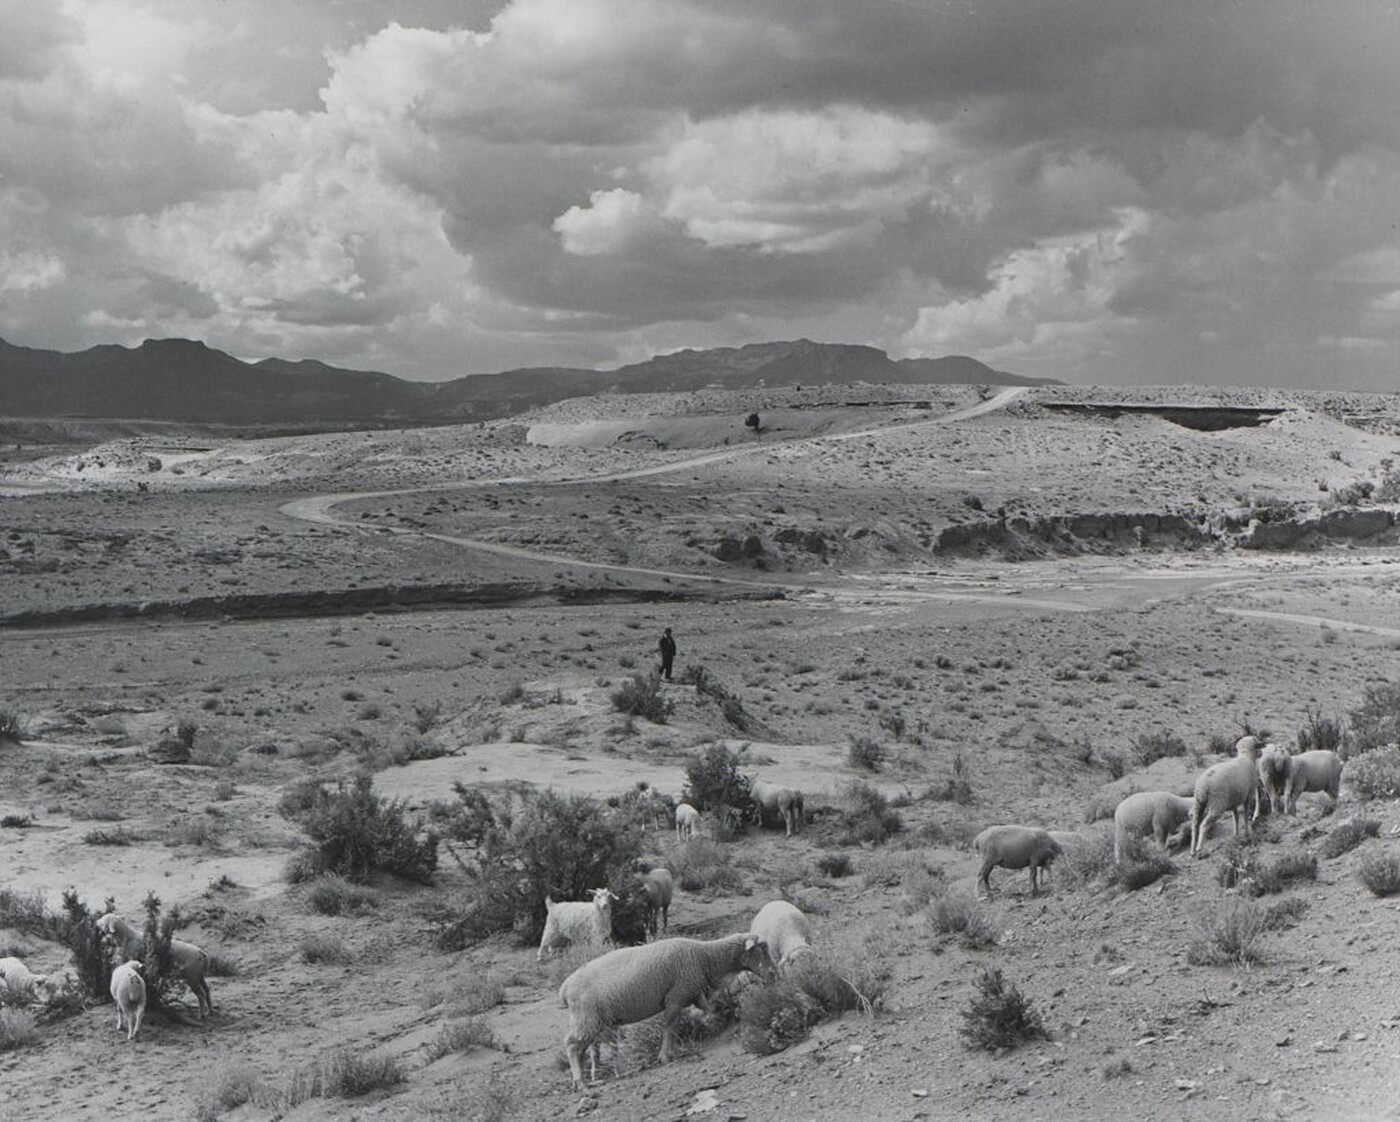 Laura Gilpin (1891–1979), The Little Shepherd, 1950